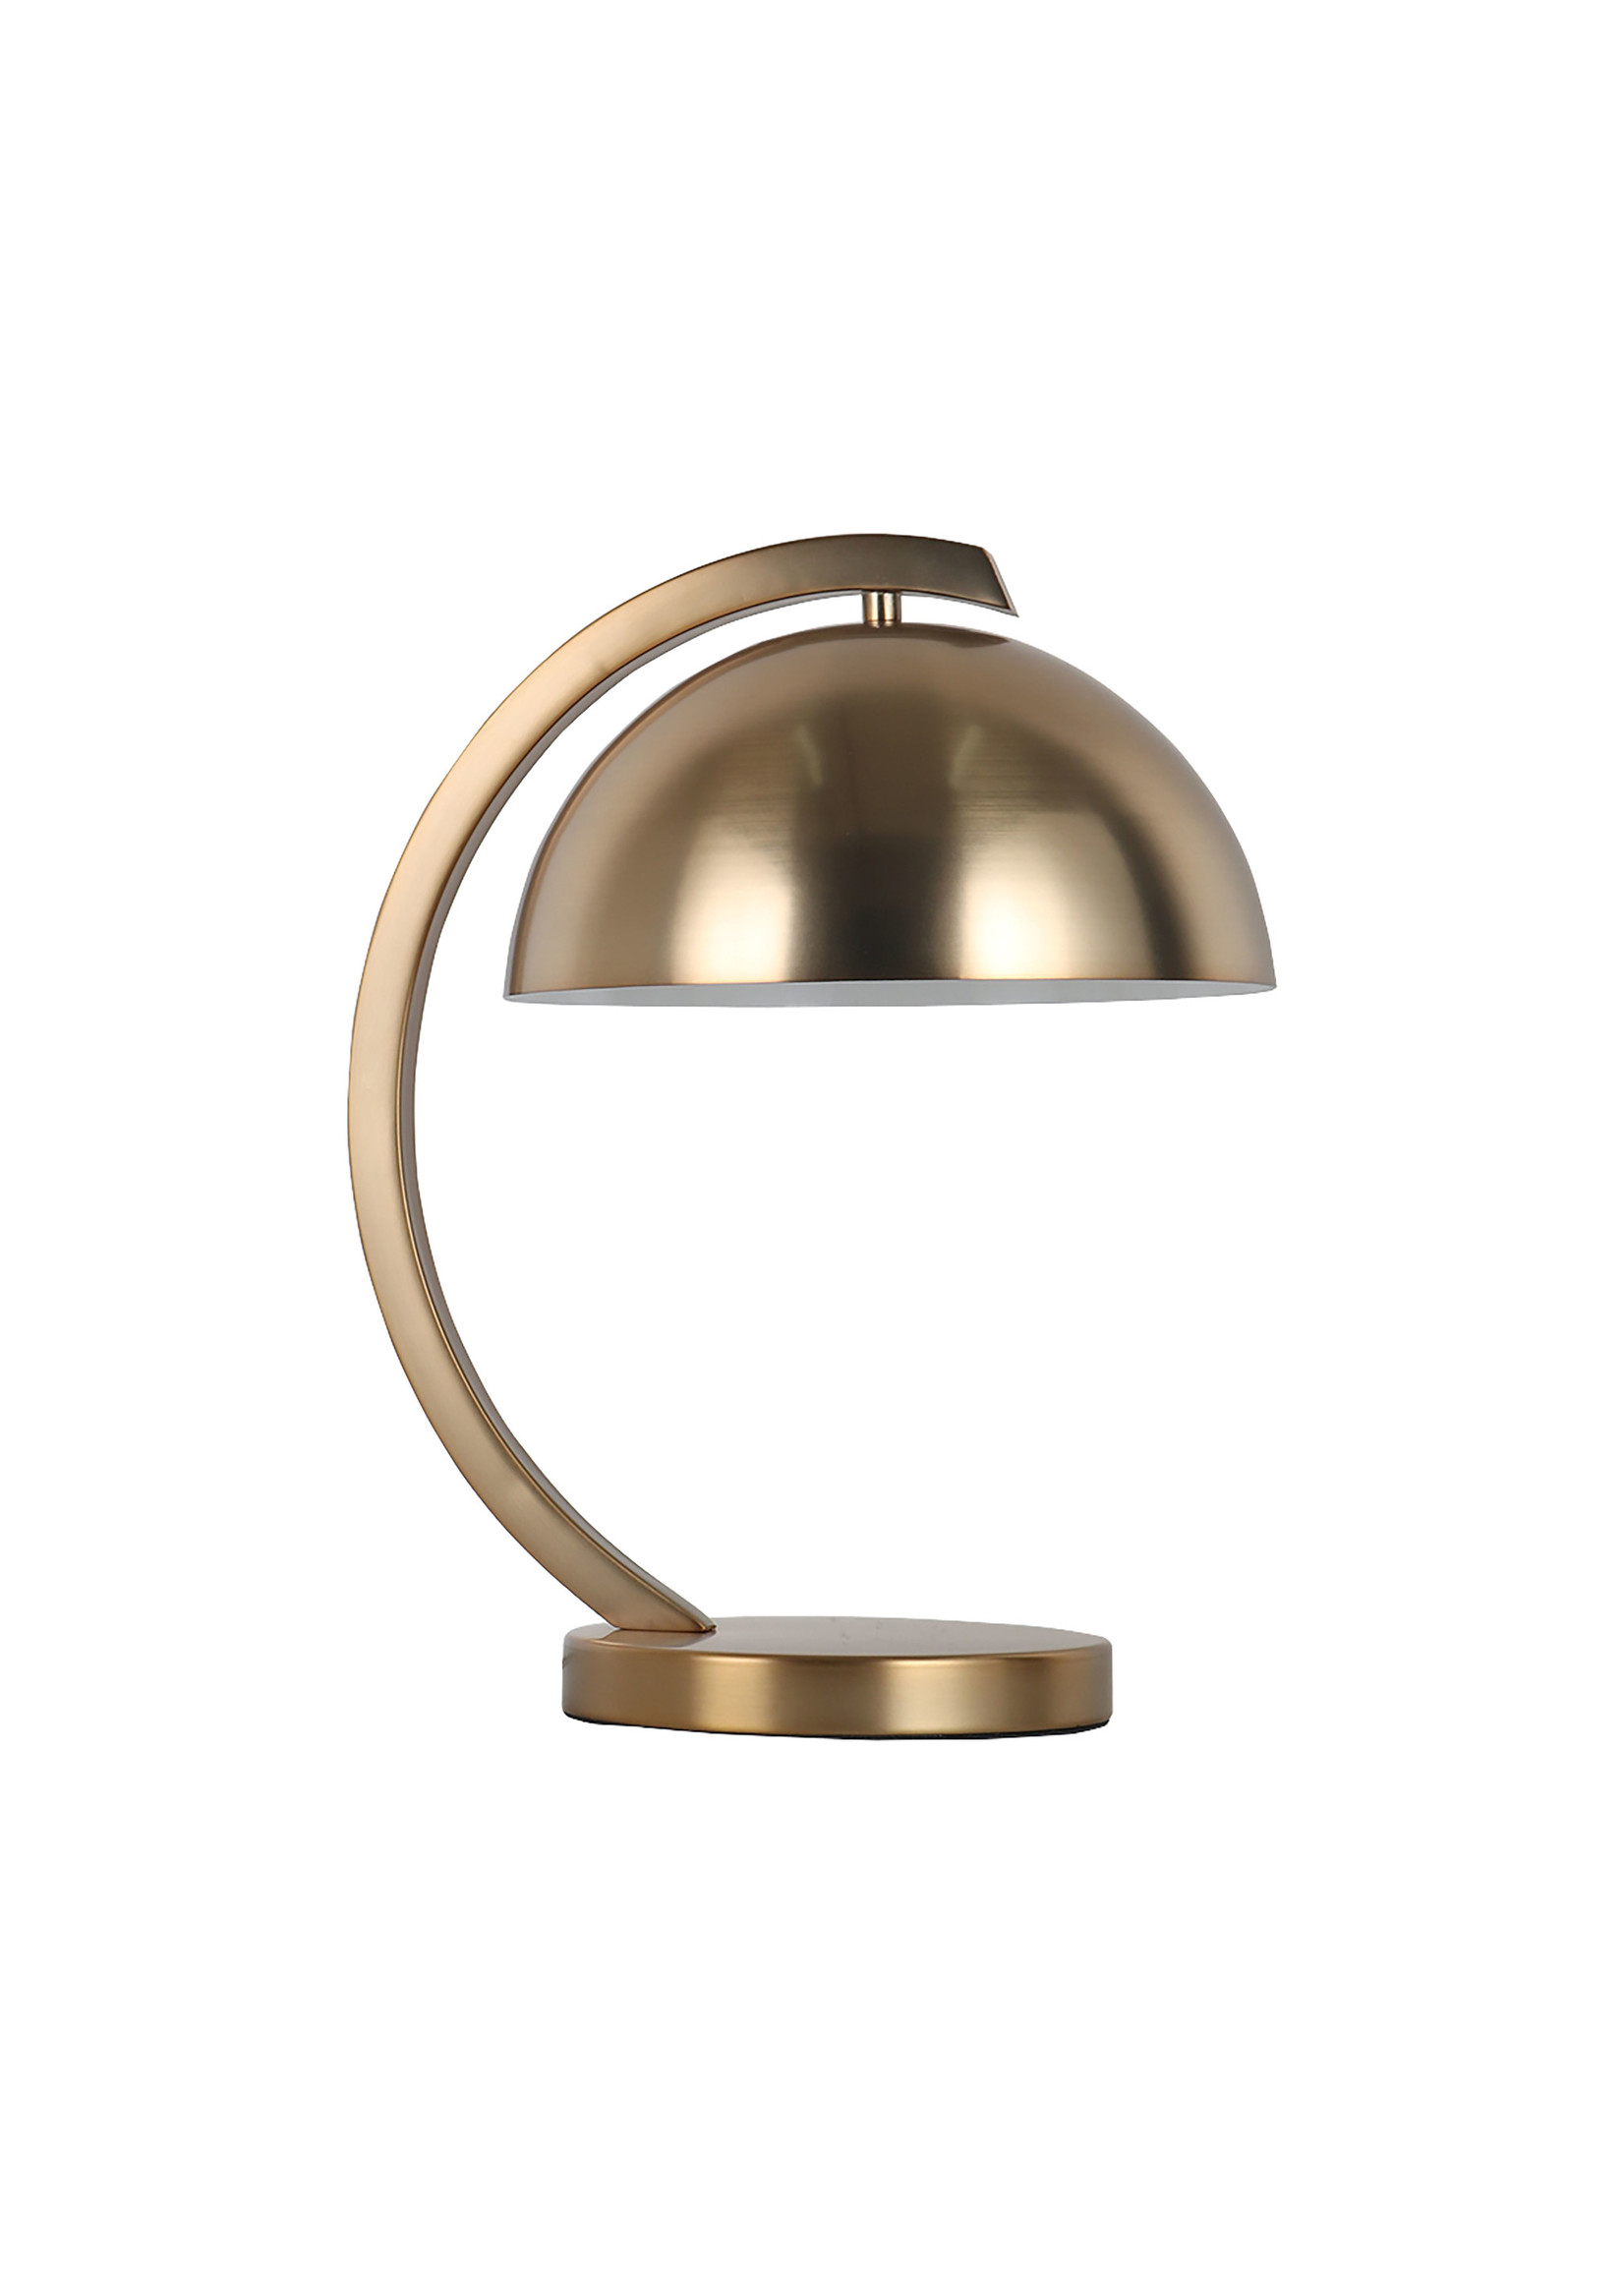 "Sagebrook Home SBH 15.25"" Metal Dome Shade Table Lamp Gold"